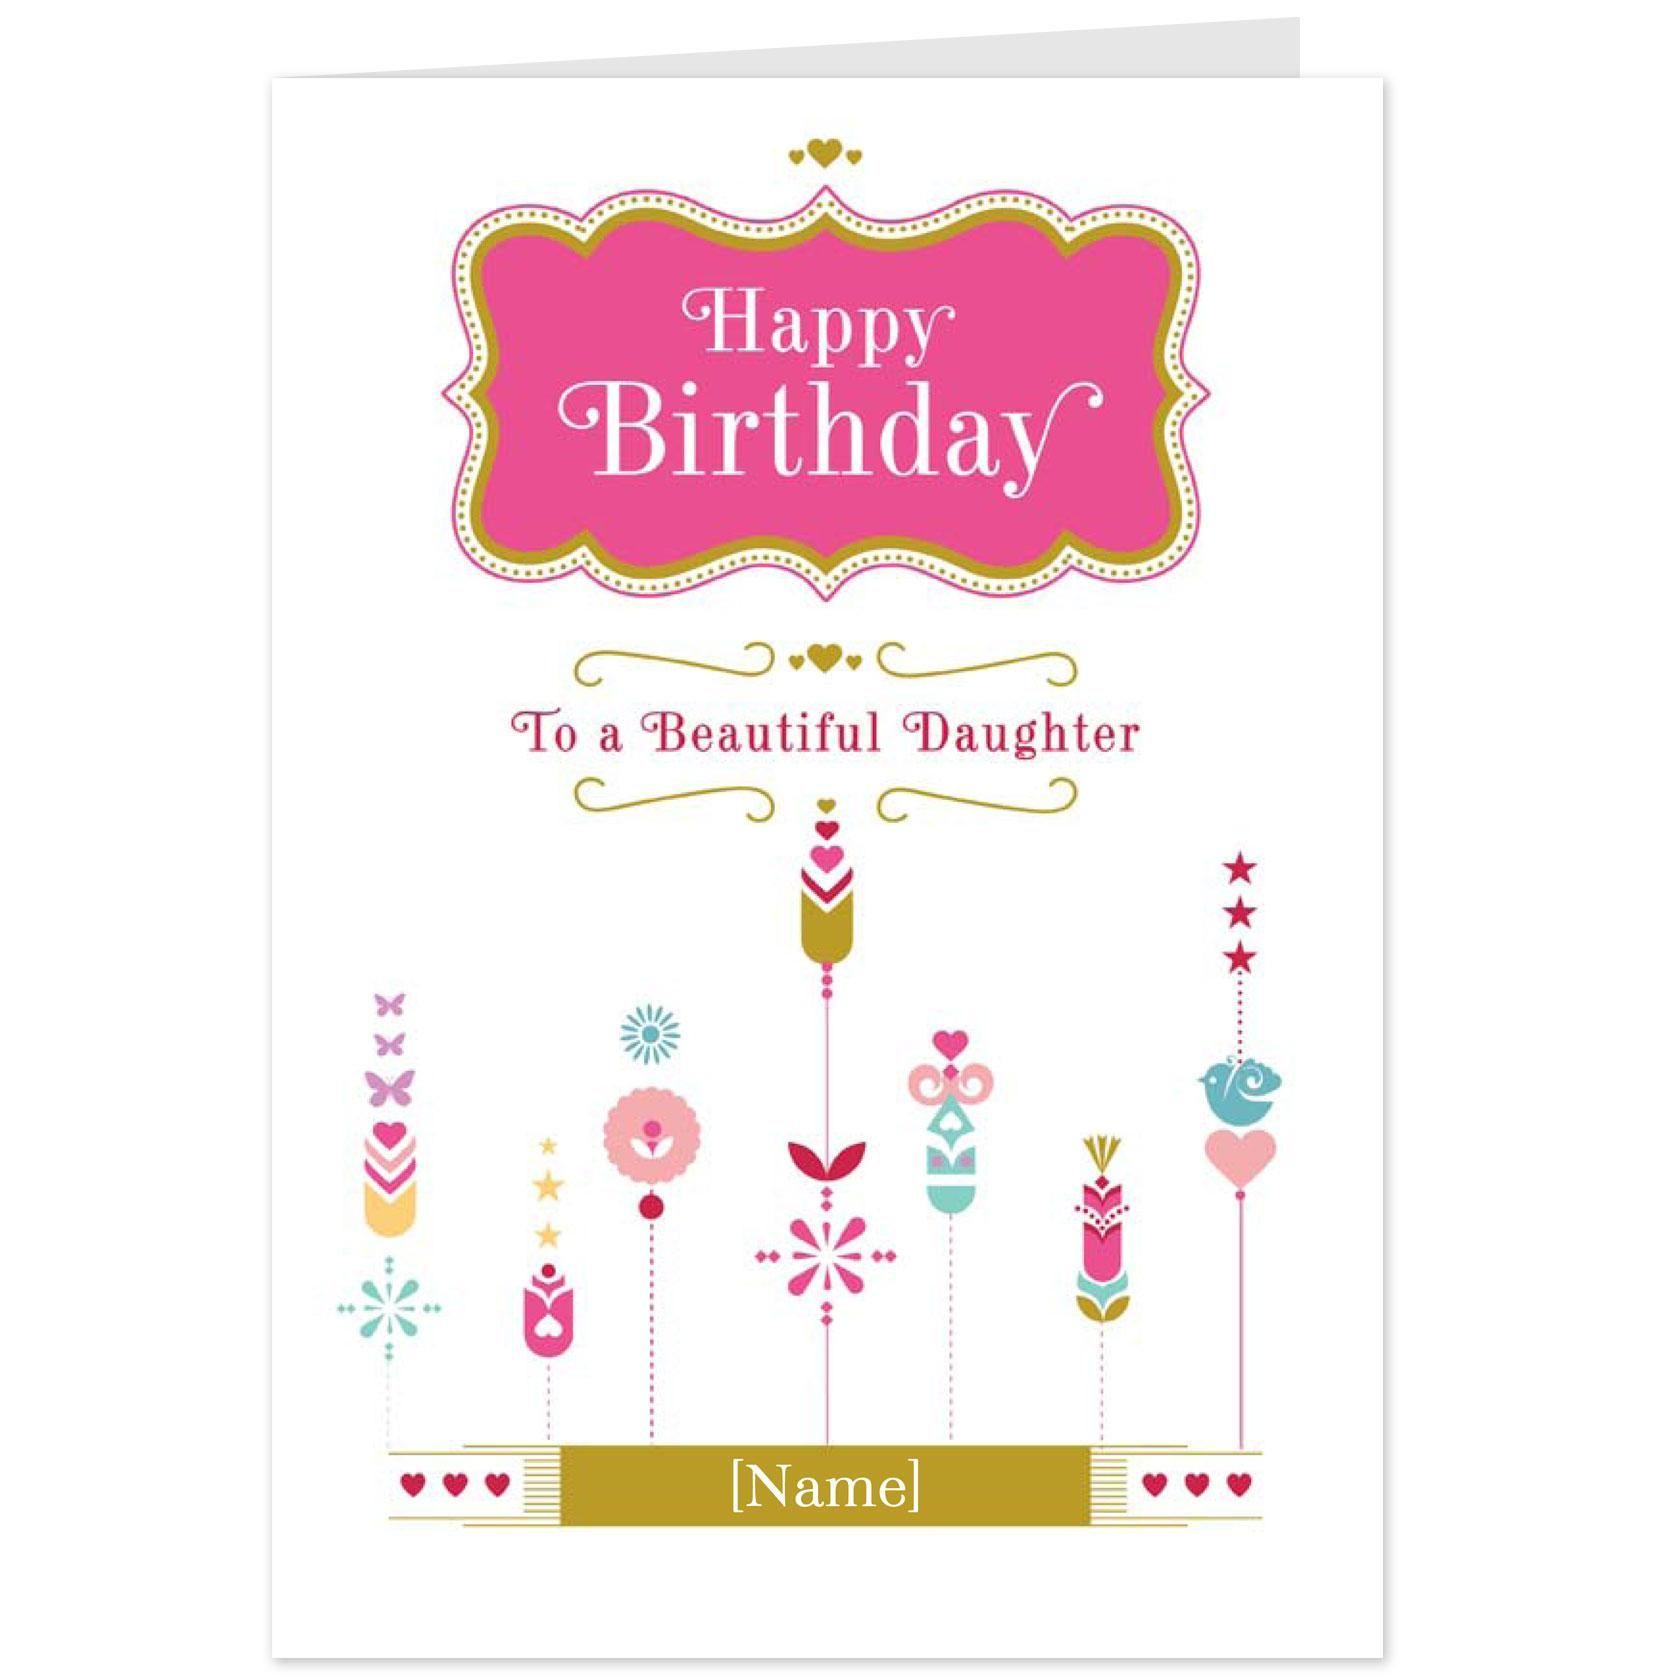 Free Printable Hallmark Birthday Cards | My Birthday - Free Printable Hallmark Birthday Cards